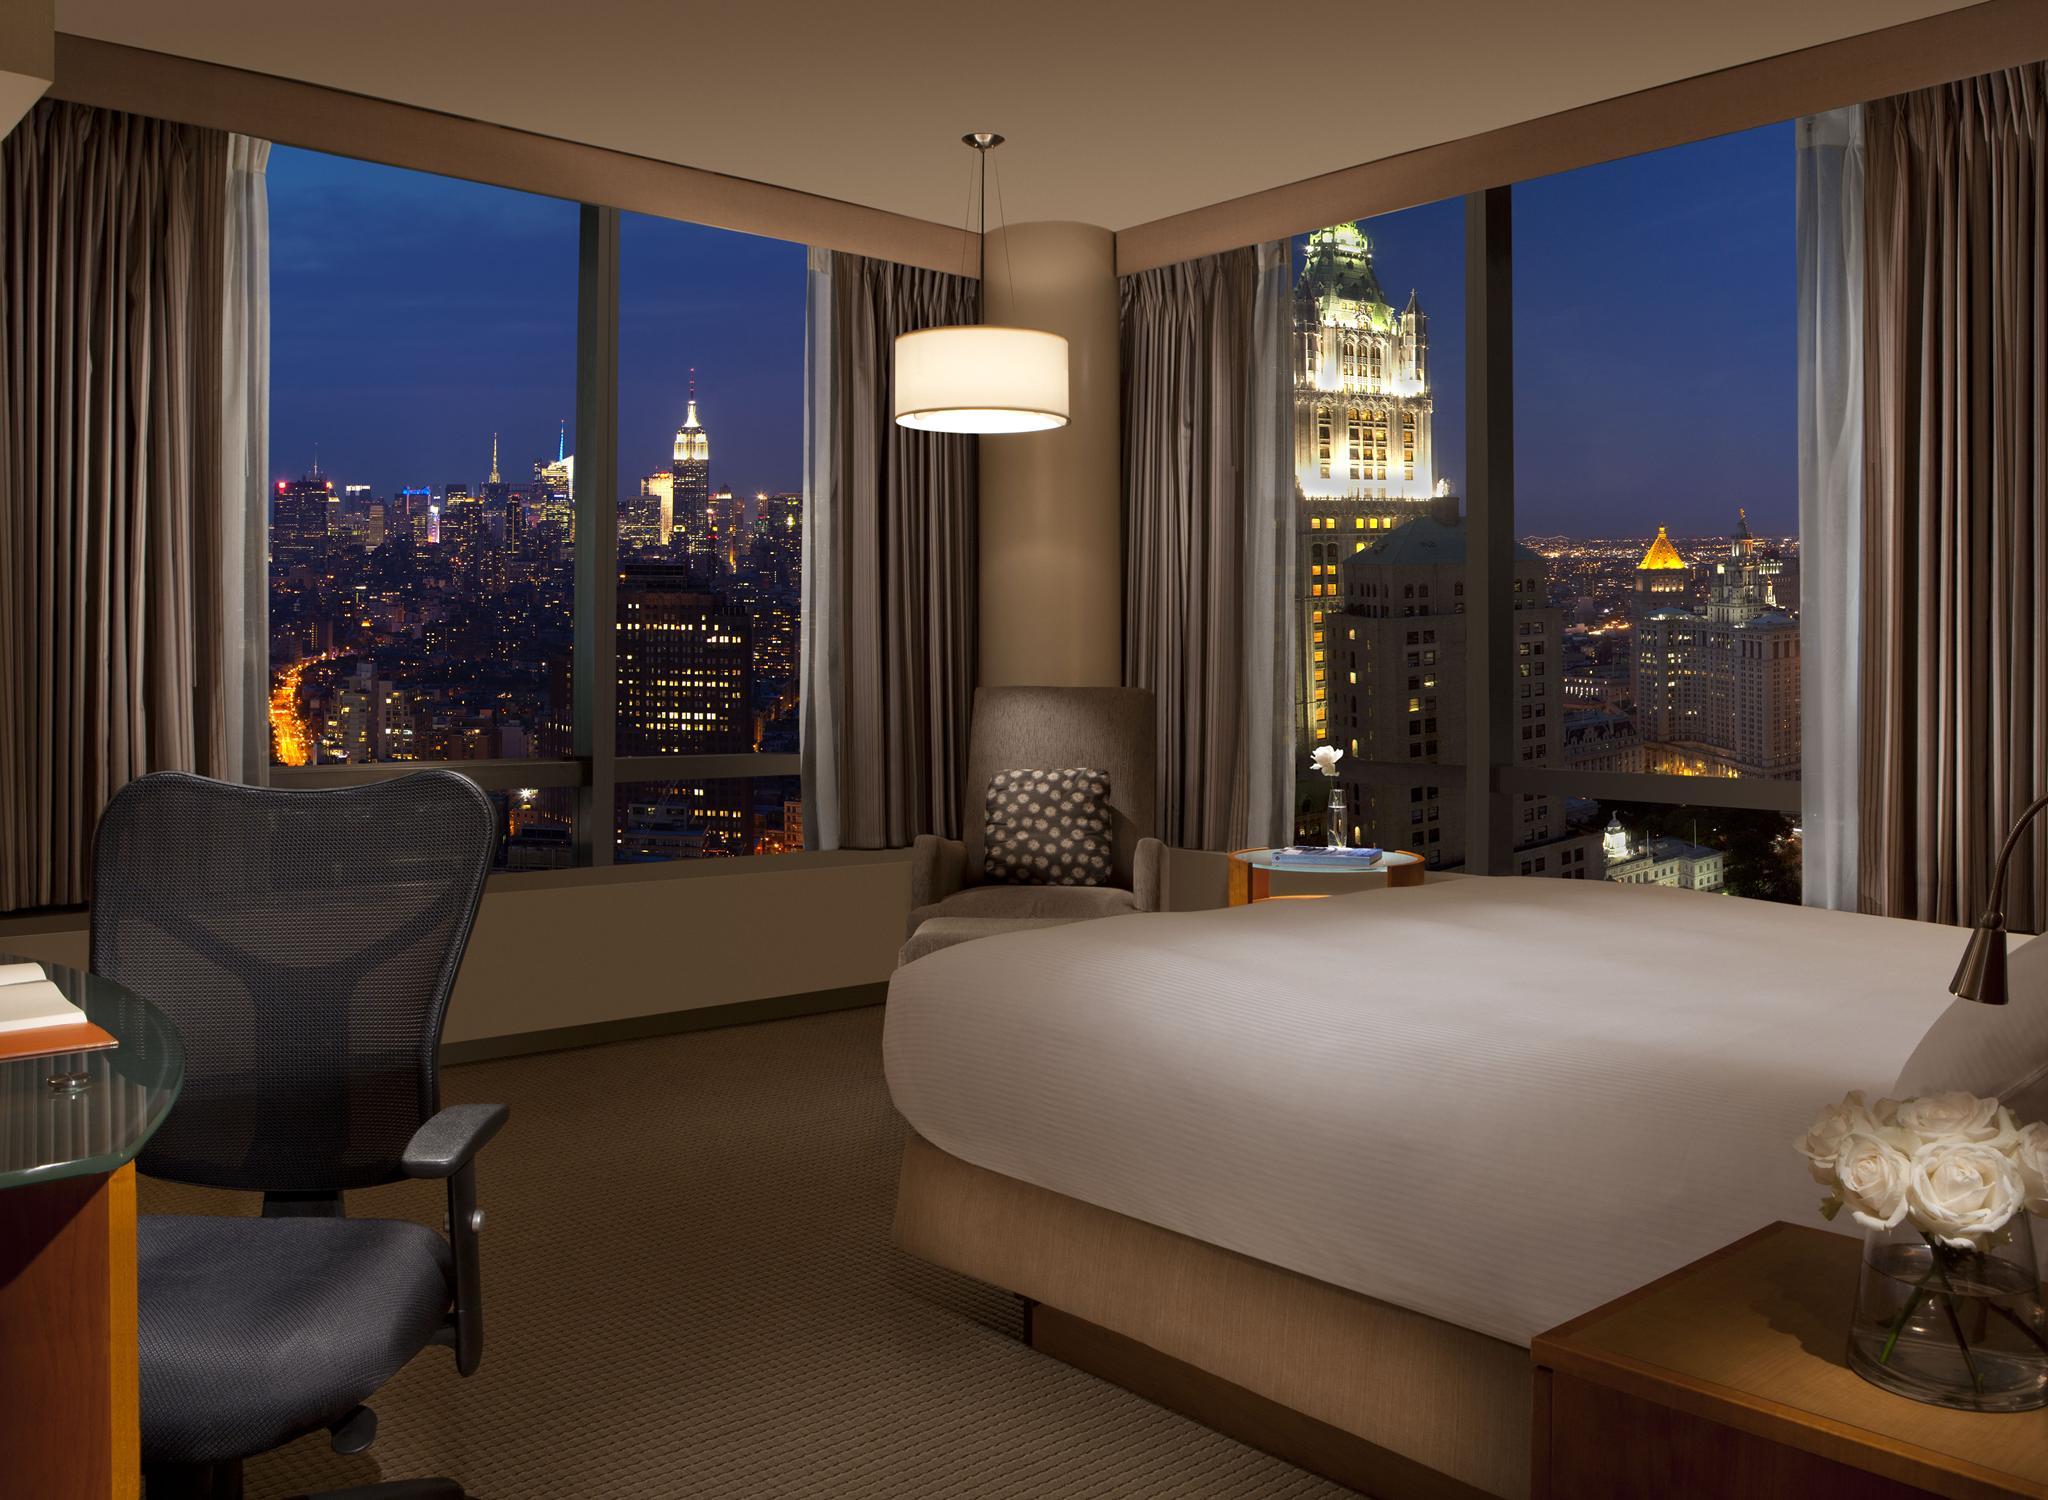 New york monroe county hilton - Hotel Millennium Hilton New York Downtown Nueva York Nueva York Habitaci N Deluxe Con